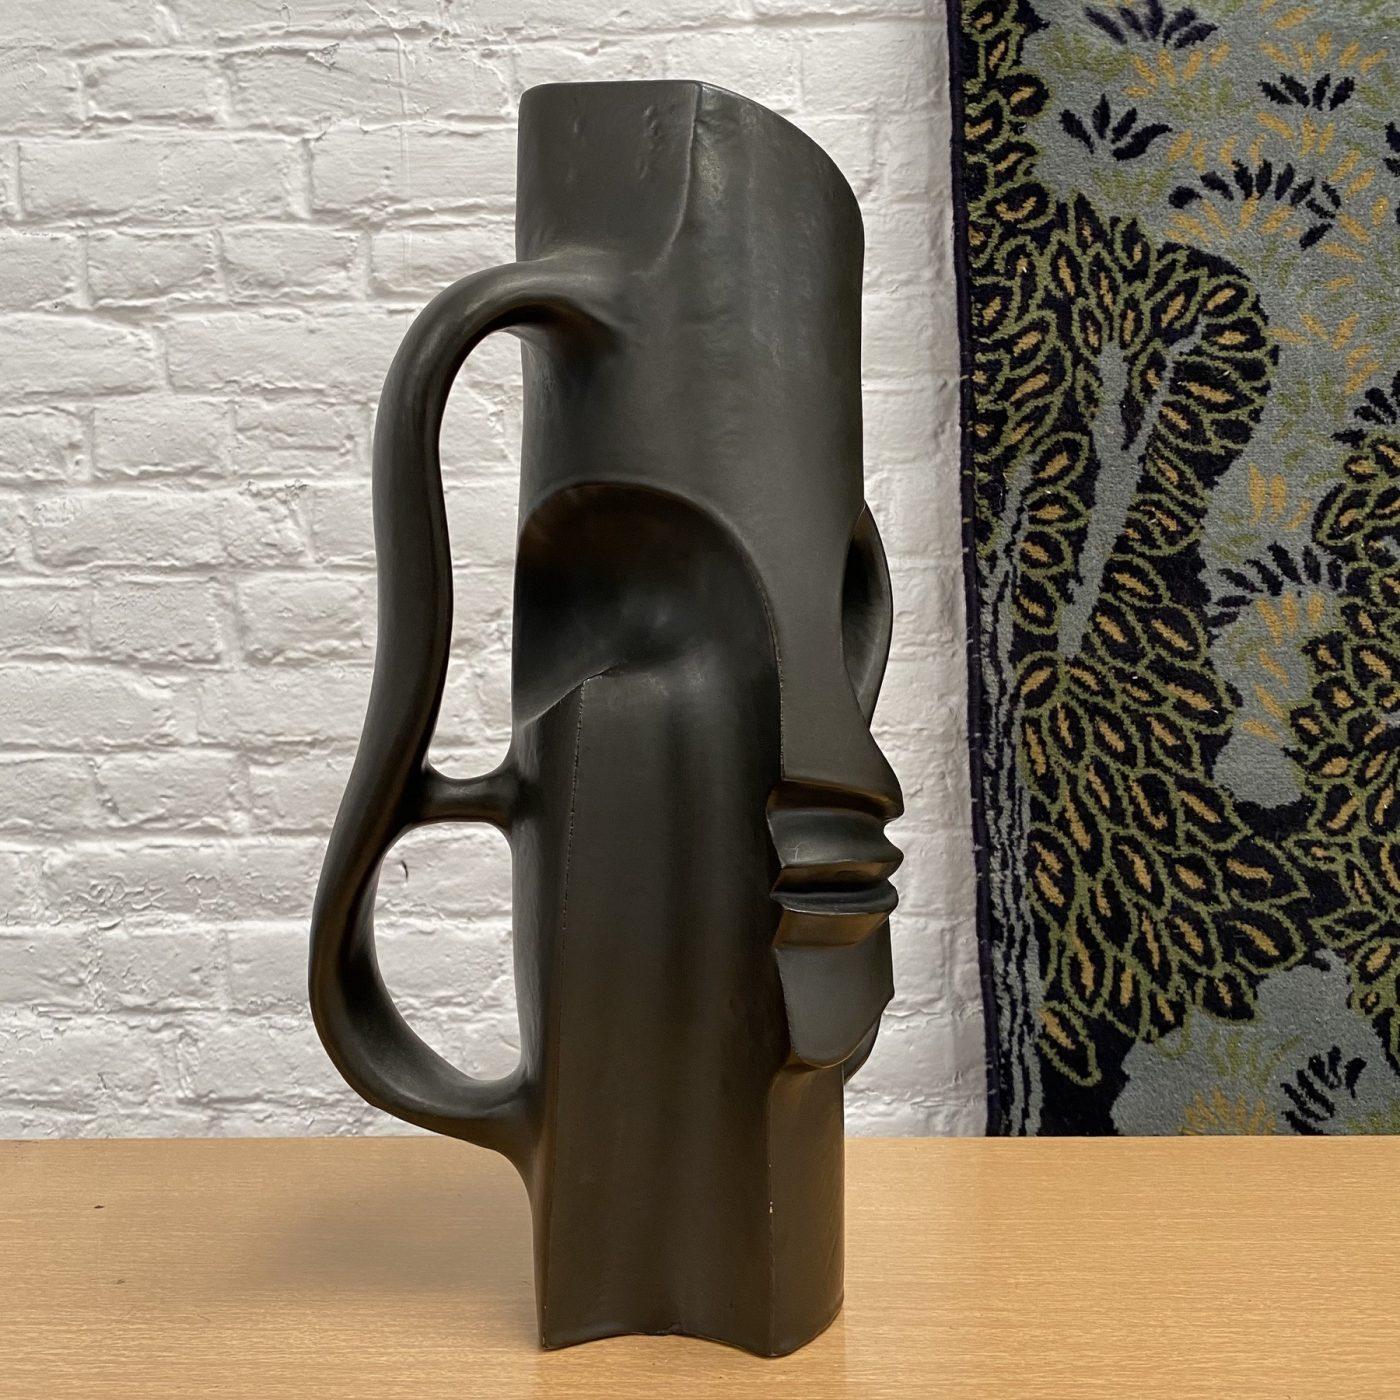 objet-vagabond-ceramic-sculpture0003